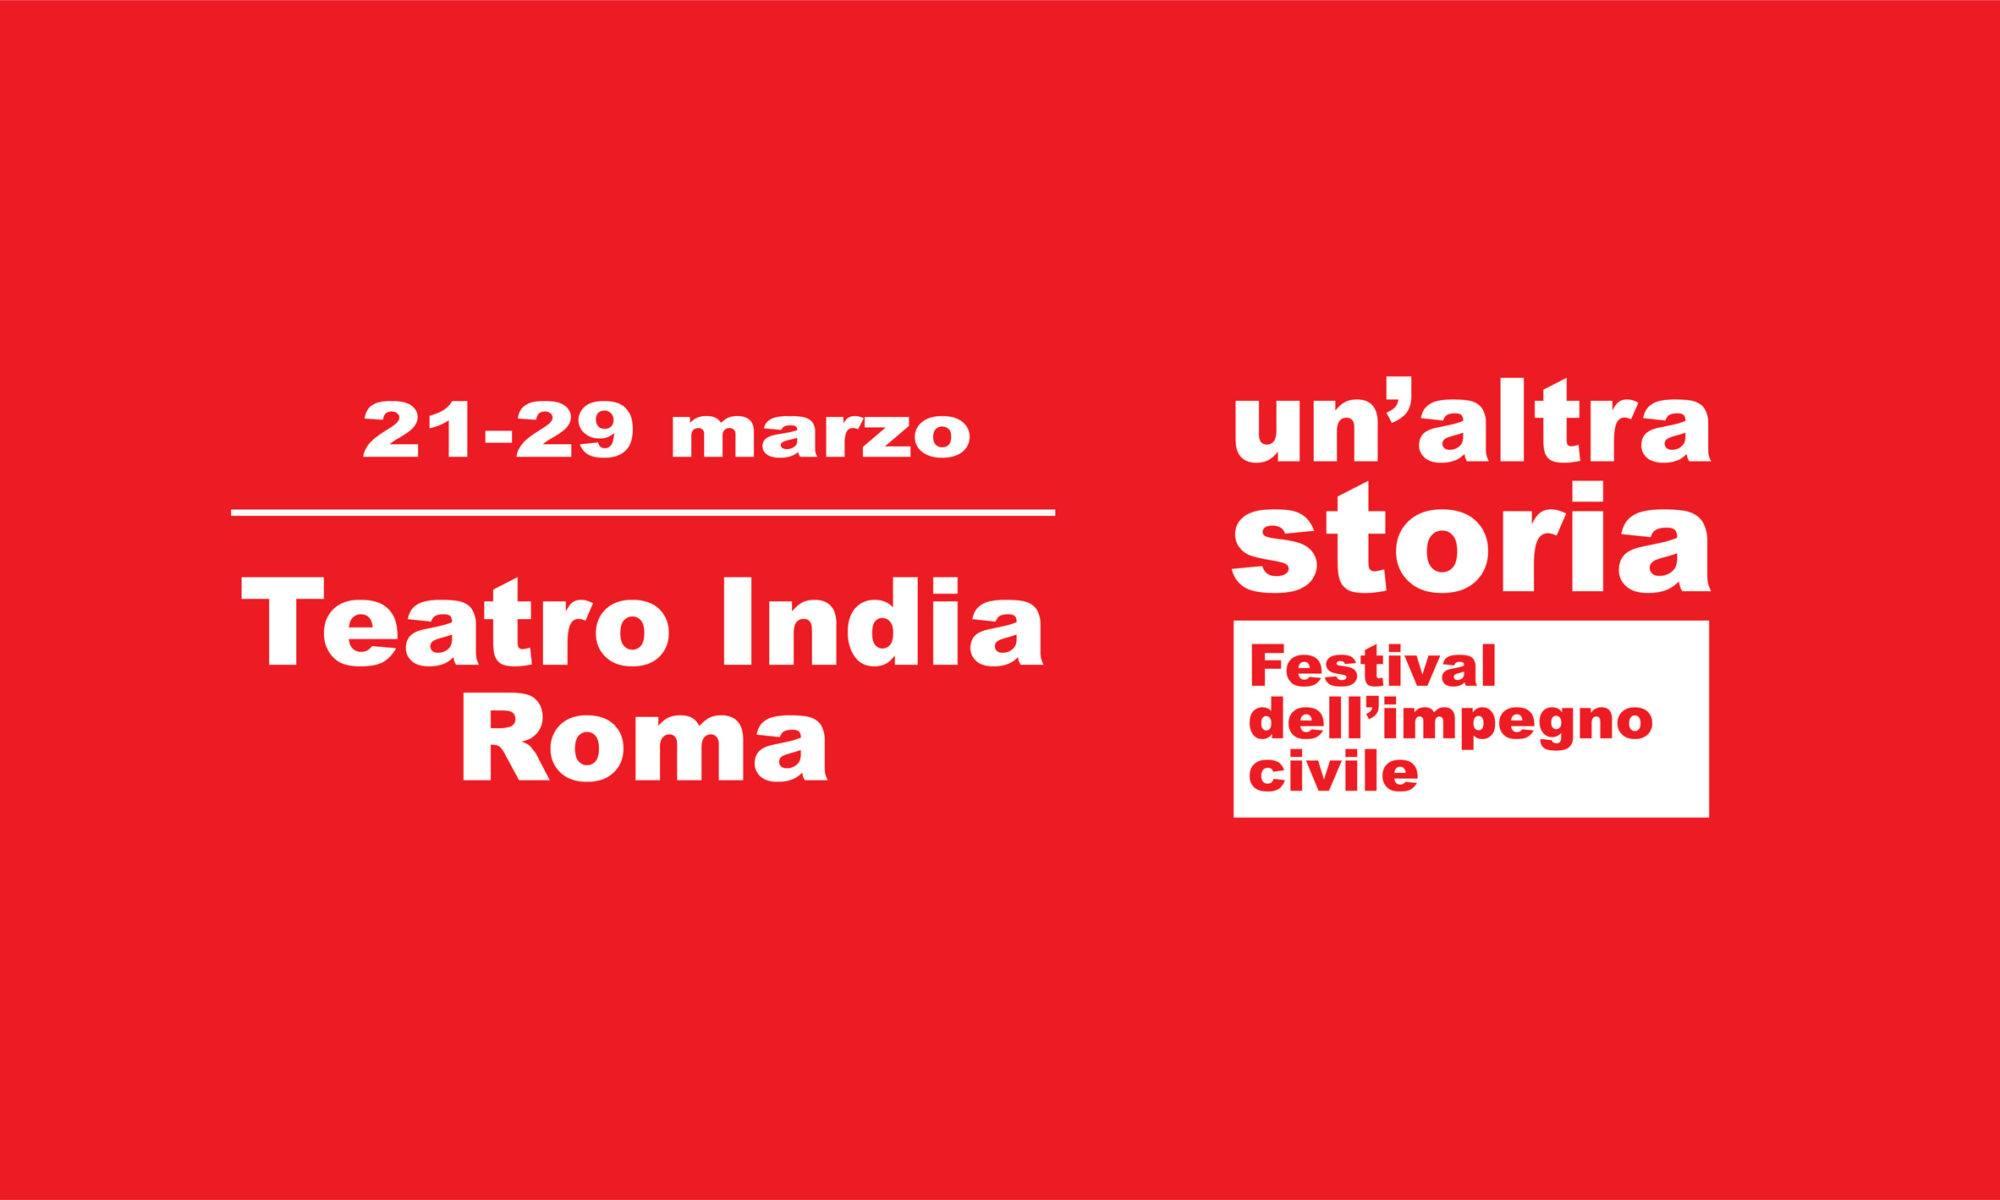 21-29 bannerfestival